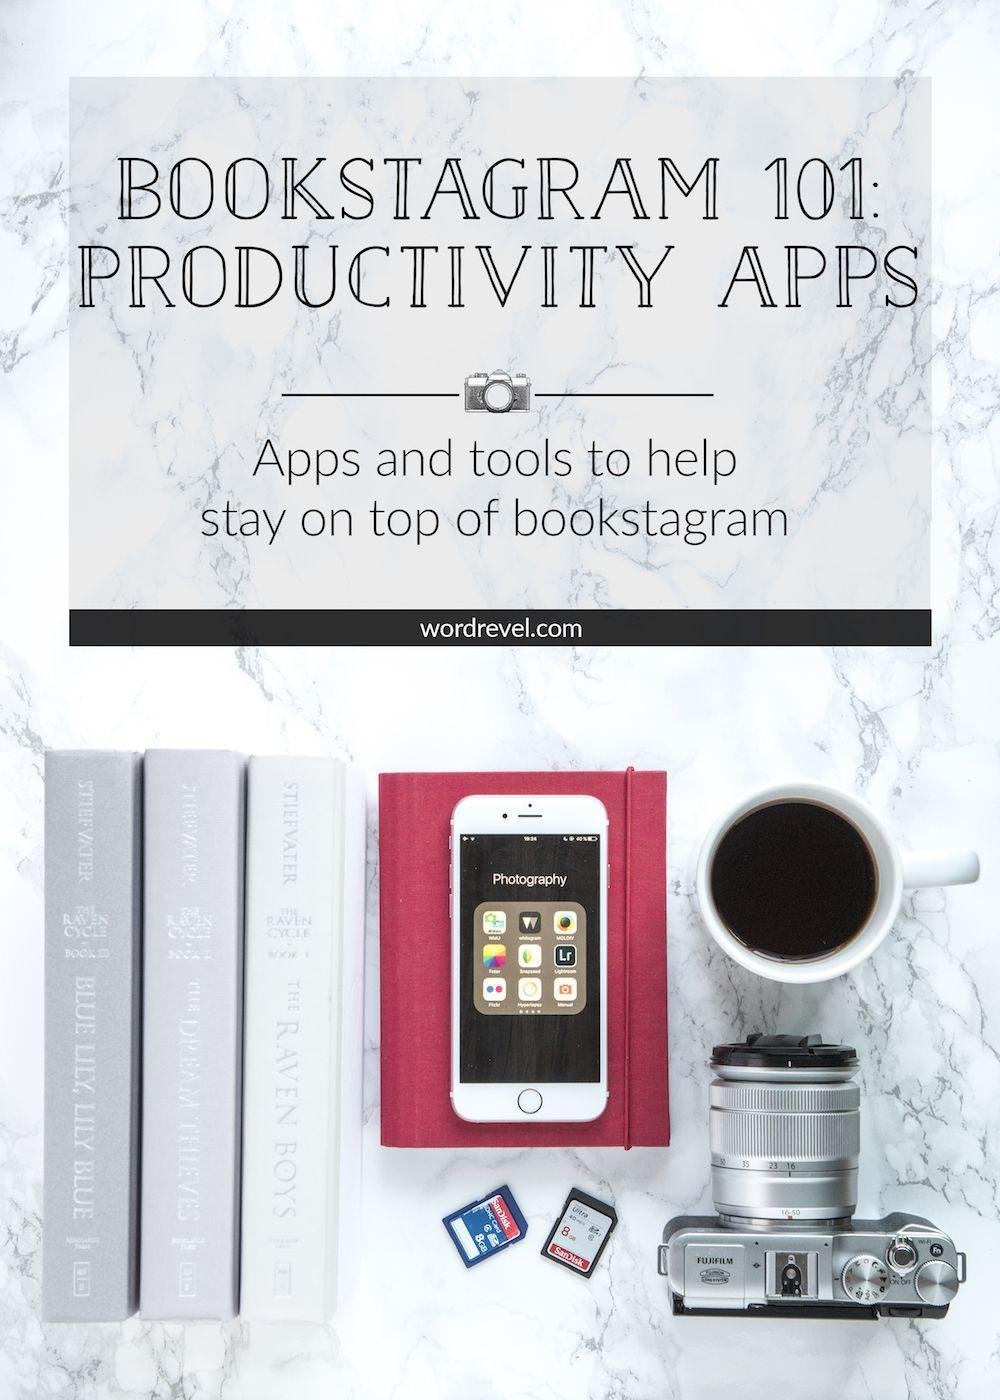 Bookstagram 101: Productivity Apps | Book instagram ...